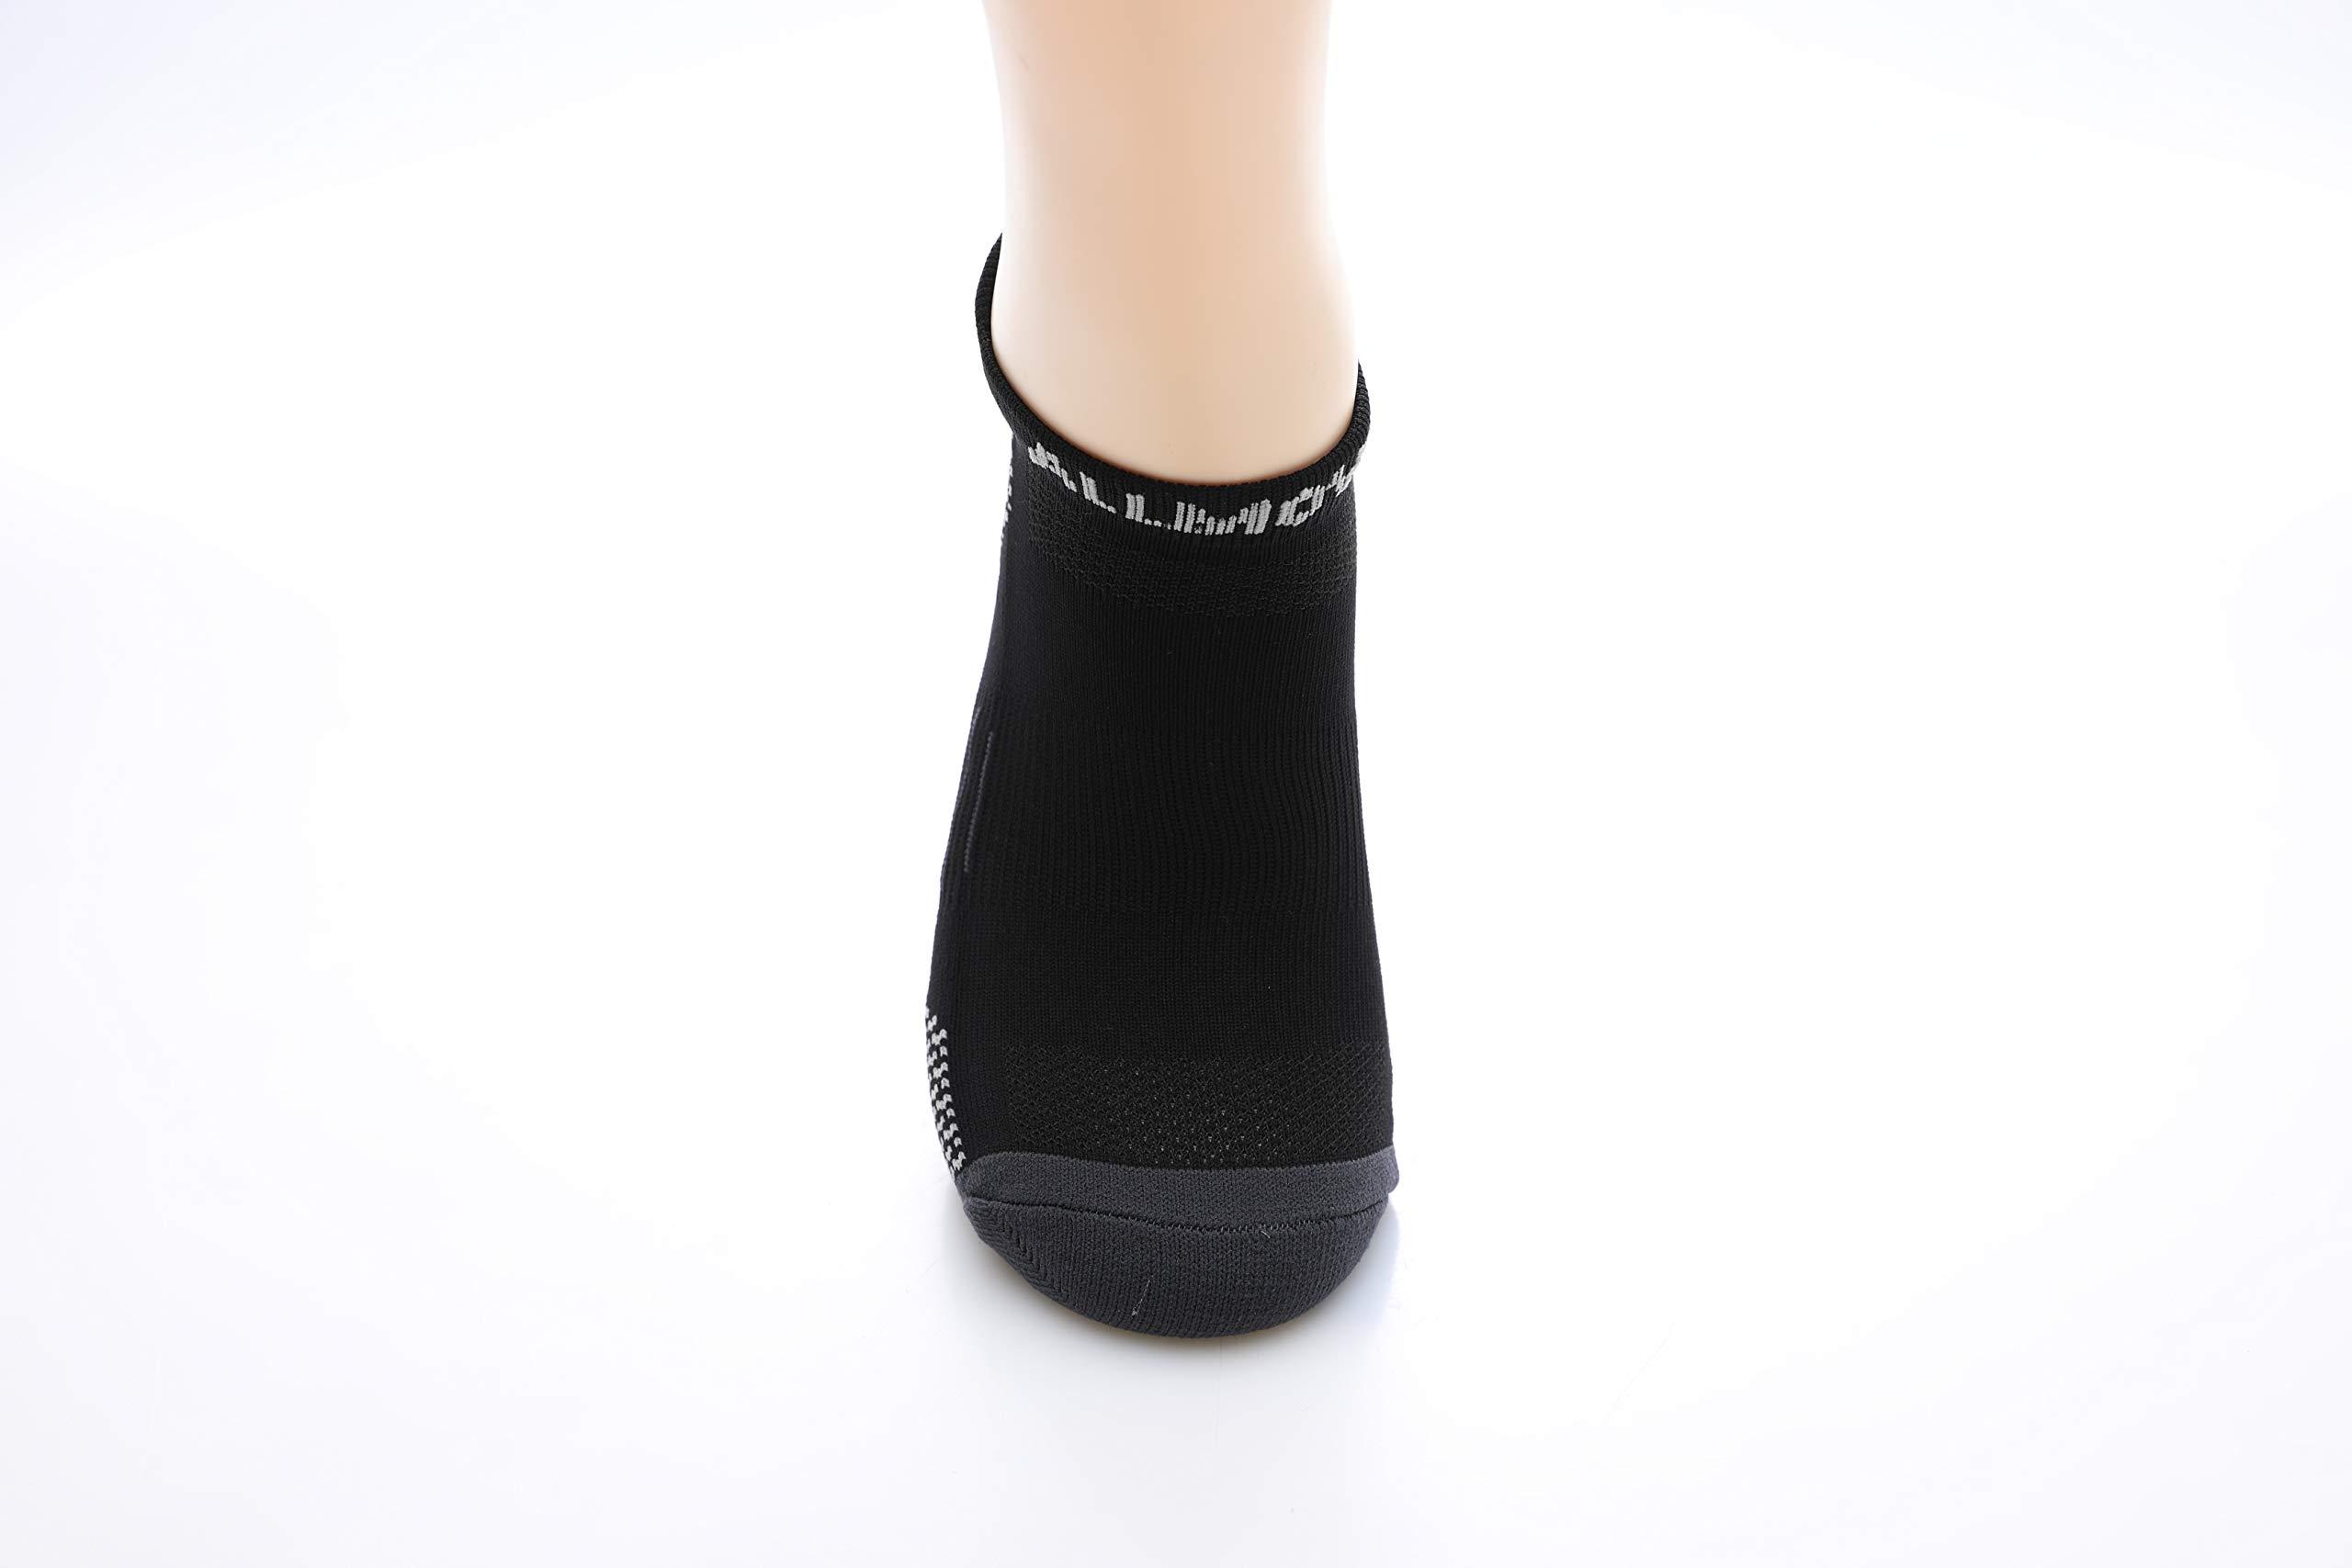 RuRu Monkey Mens No show Sport Socks, Moisture Control, Arch Support (Black and Grey 6Pair)